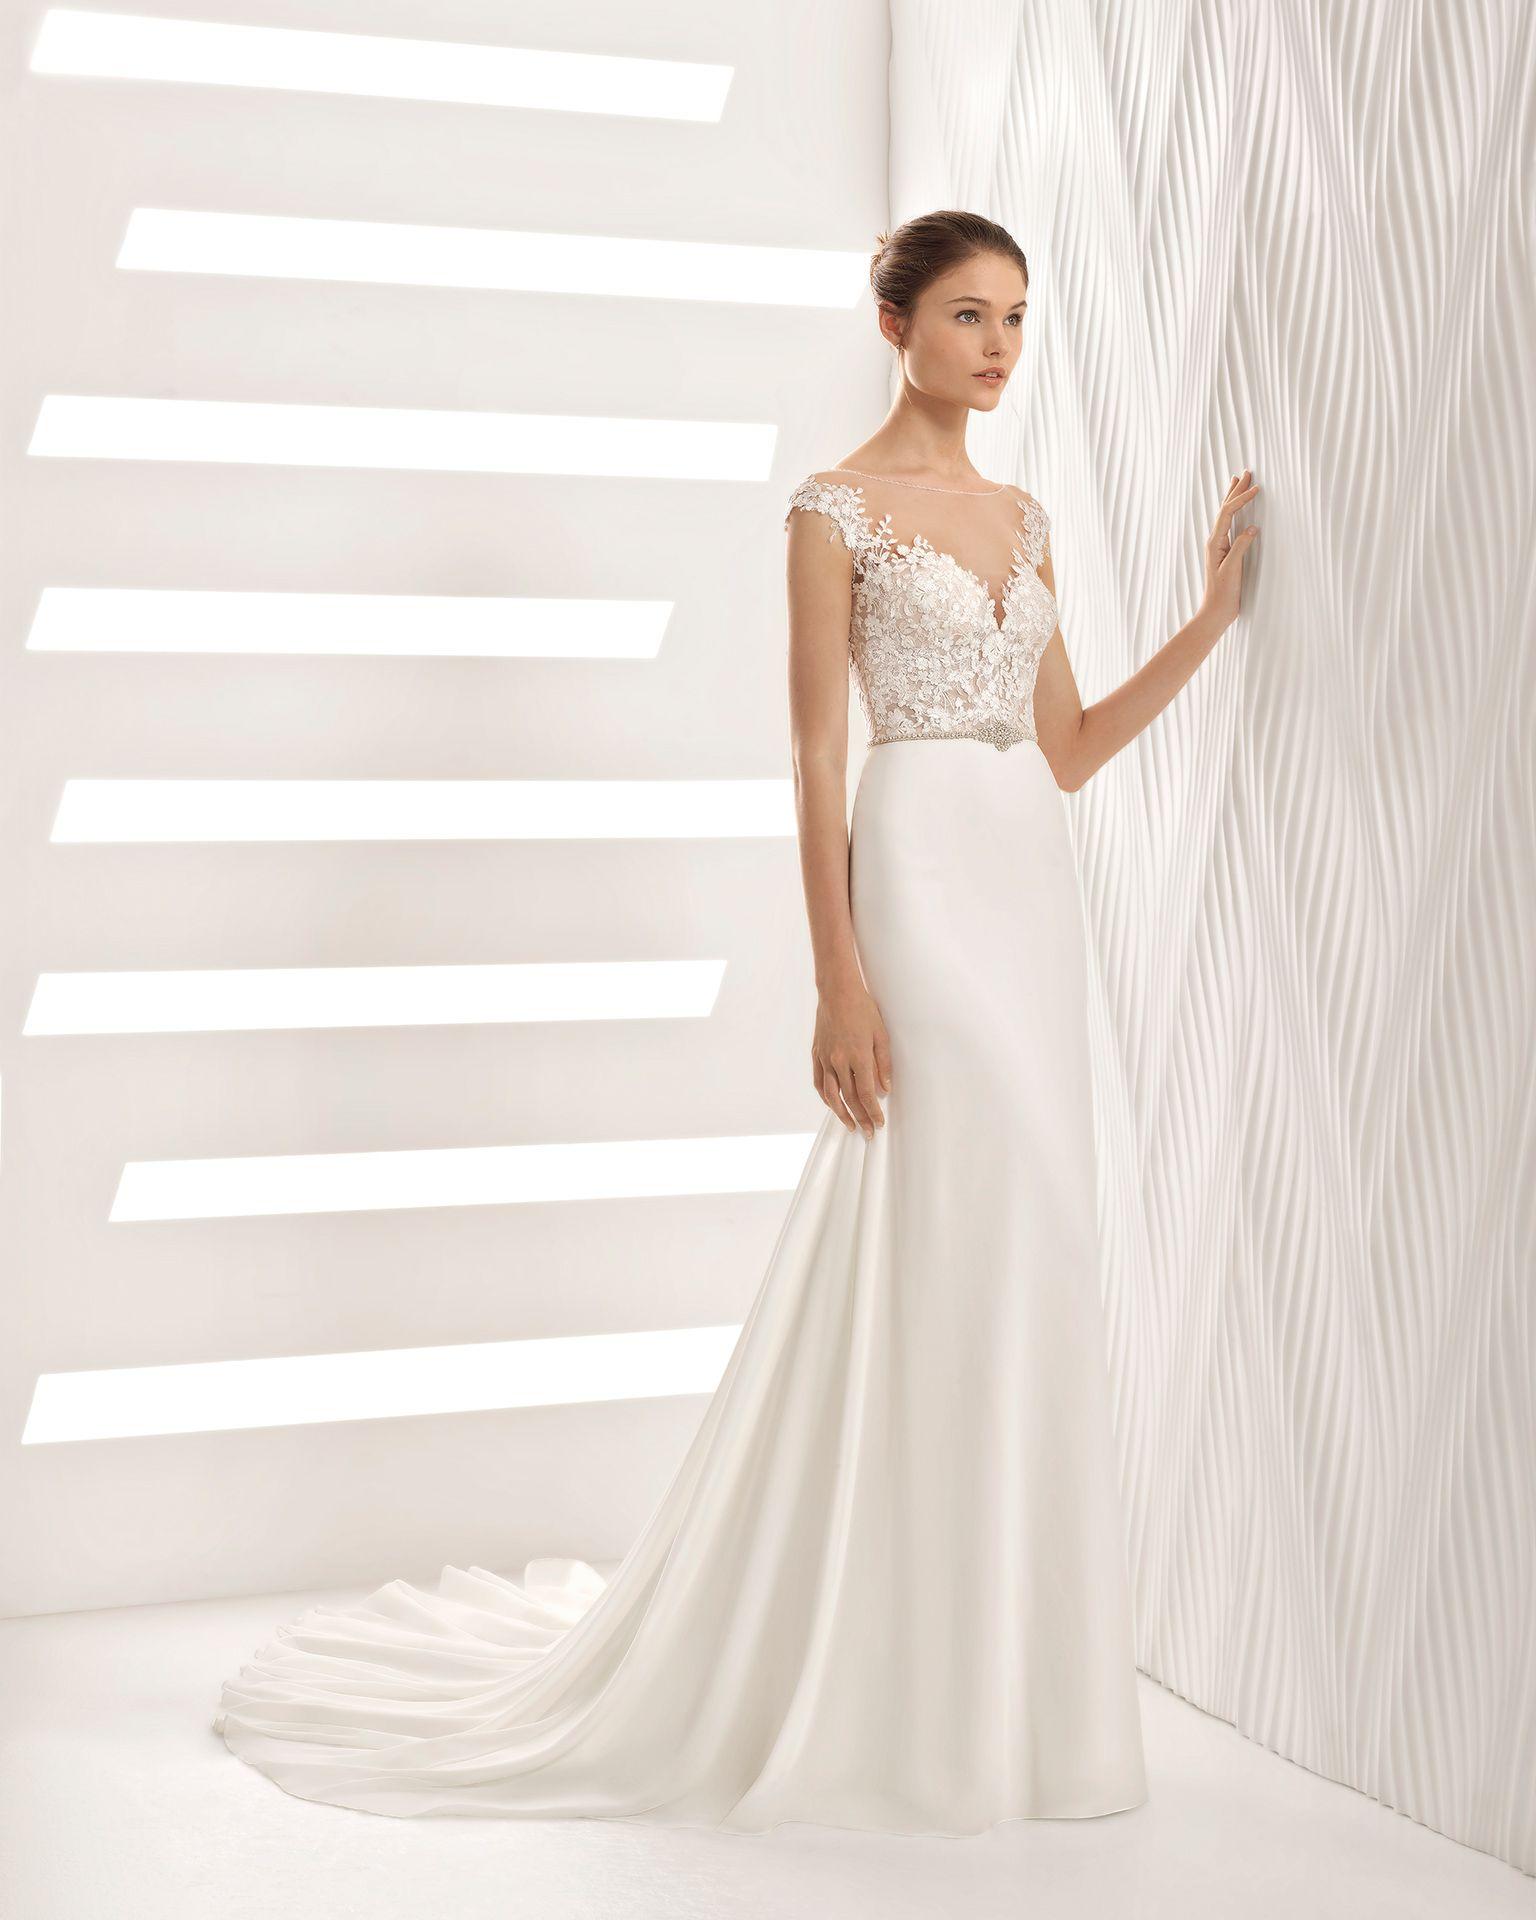 Vestidos De Novia Nueva Coleccion 2020 Bridal Gowns Mermaid Wedding Dress Wedding Dresses [ 1920 x 1536 Pixel ]